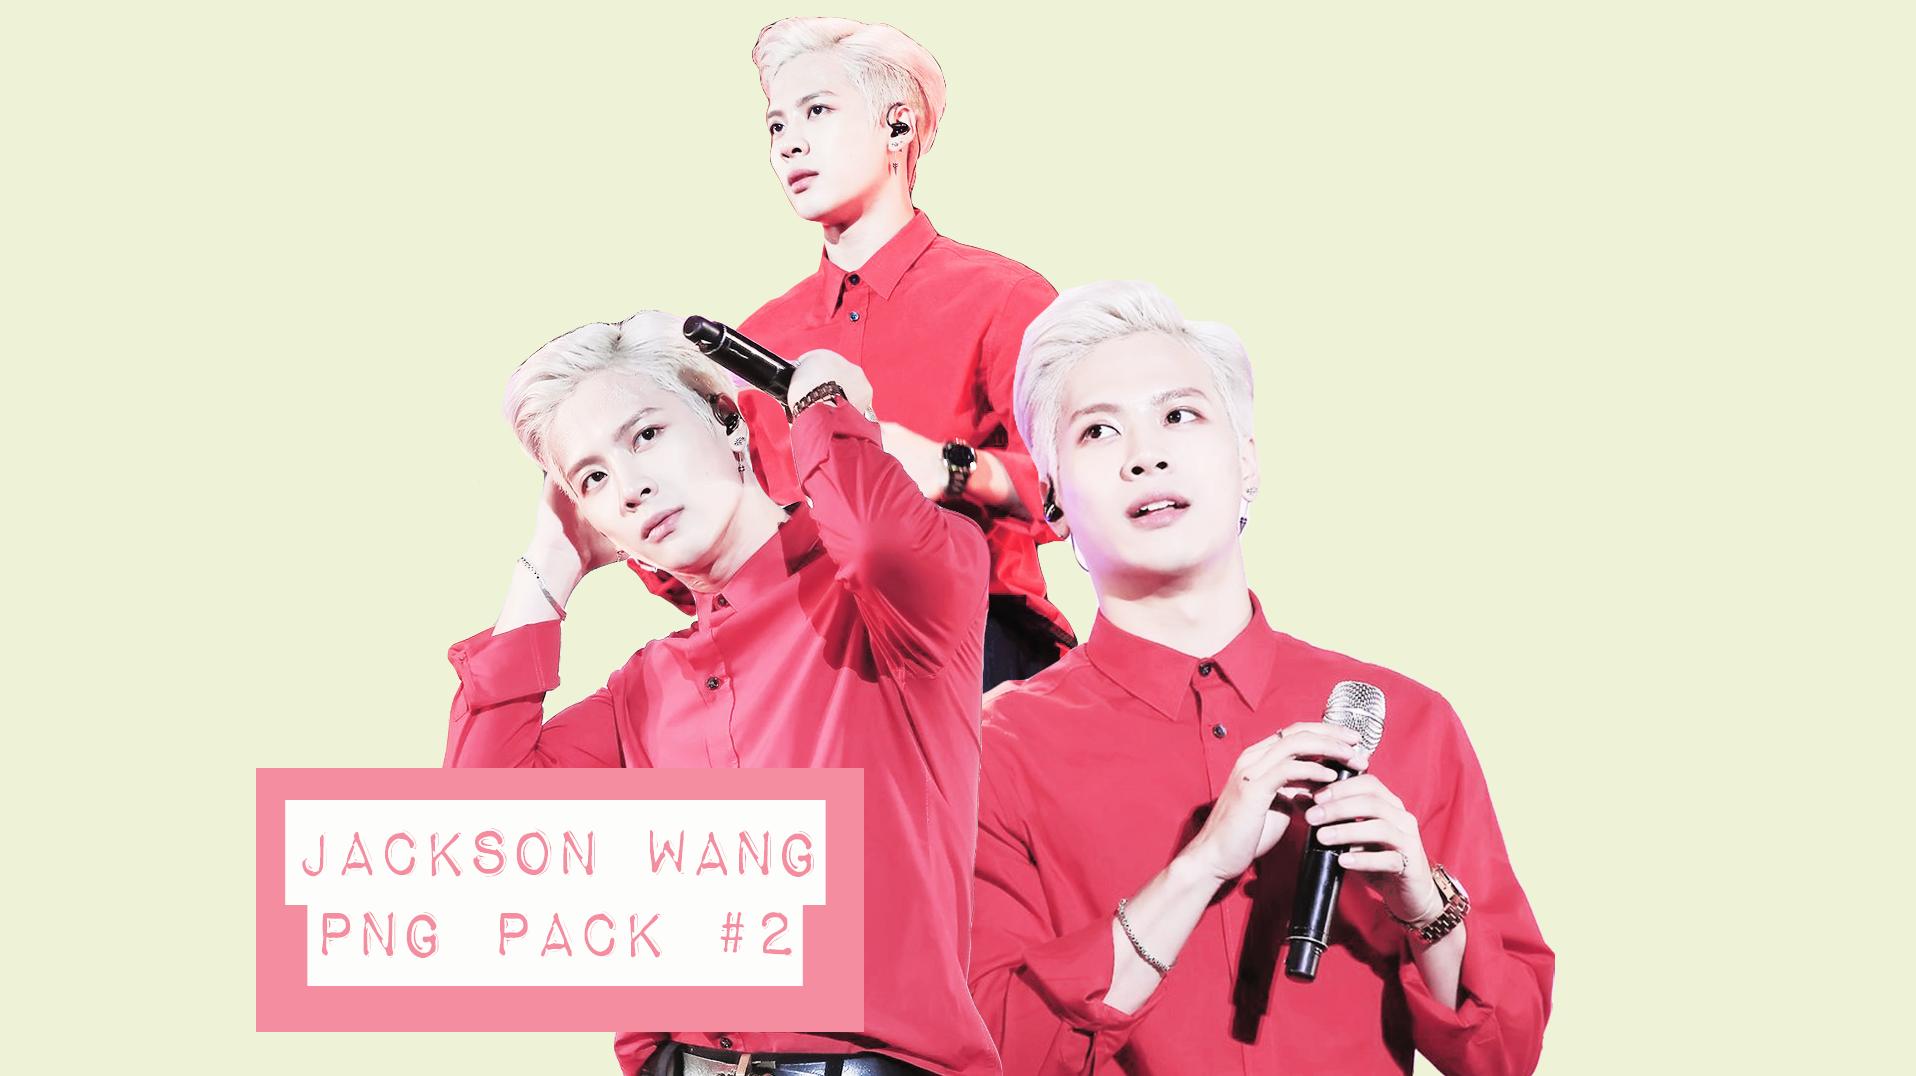 Jackson Wang 2 By Simplydiamonds On Deviantart Jackson Wang Jackson Wang